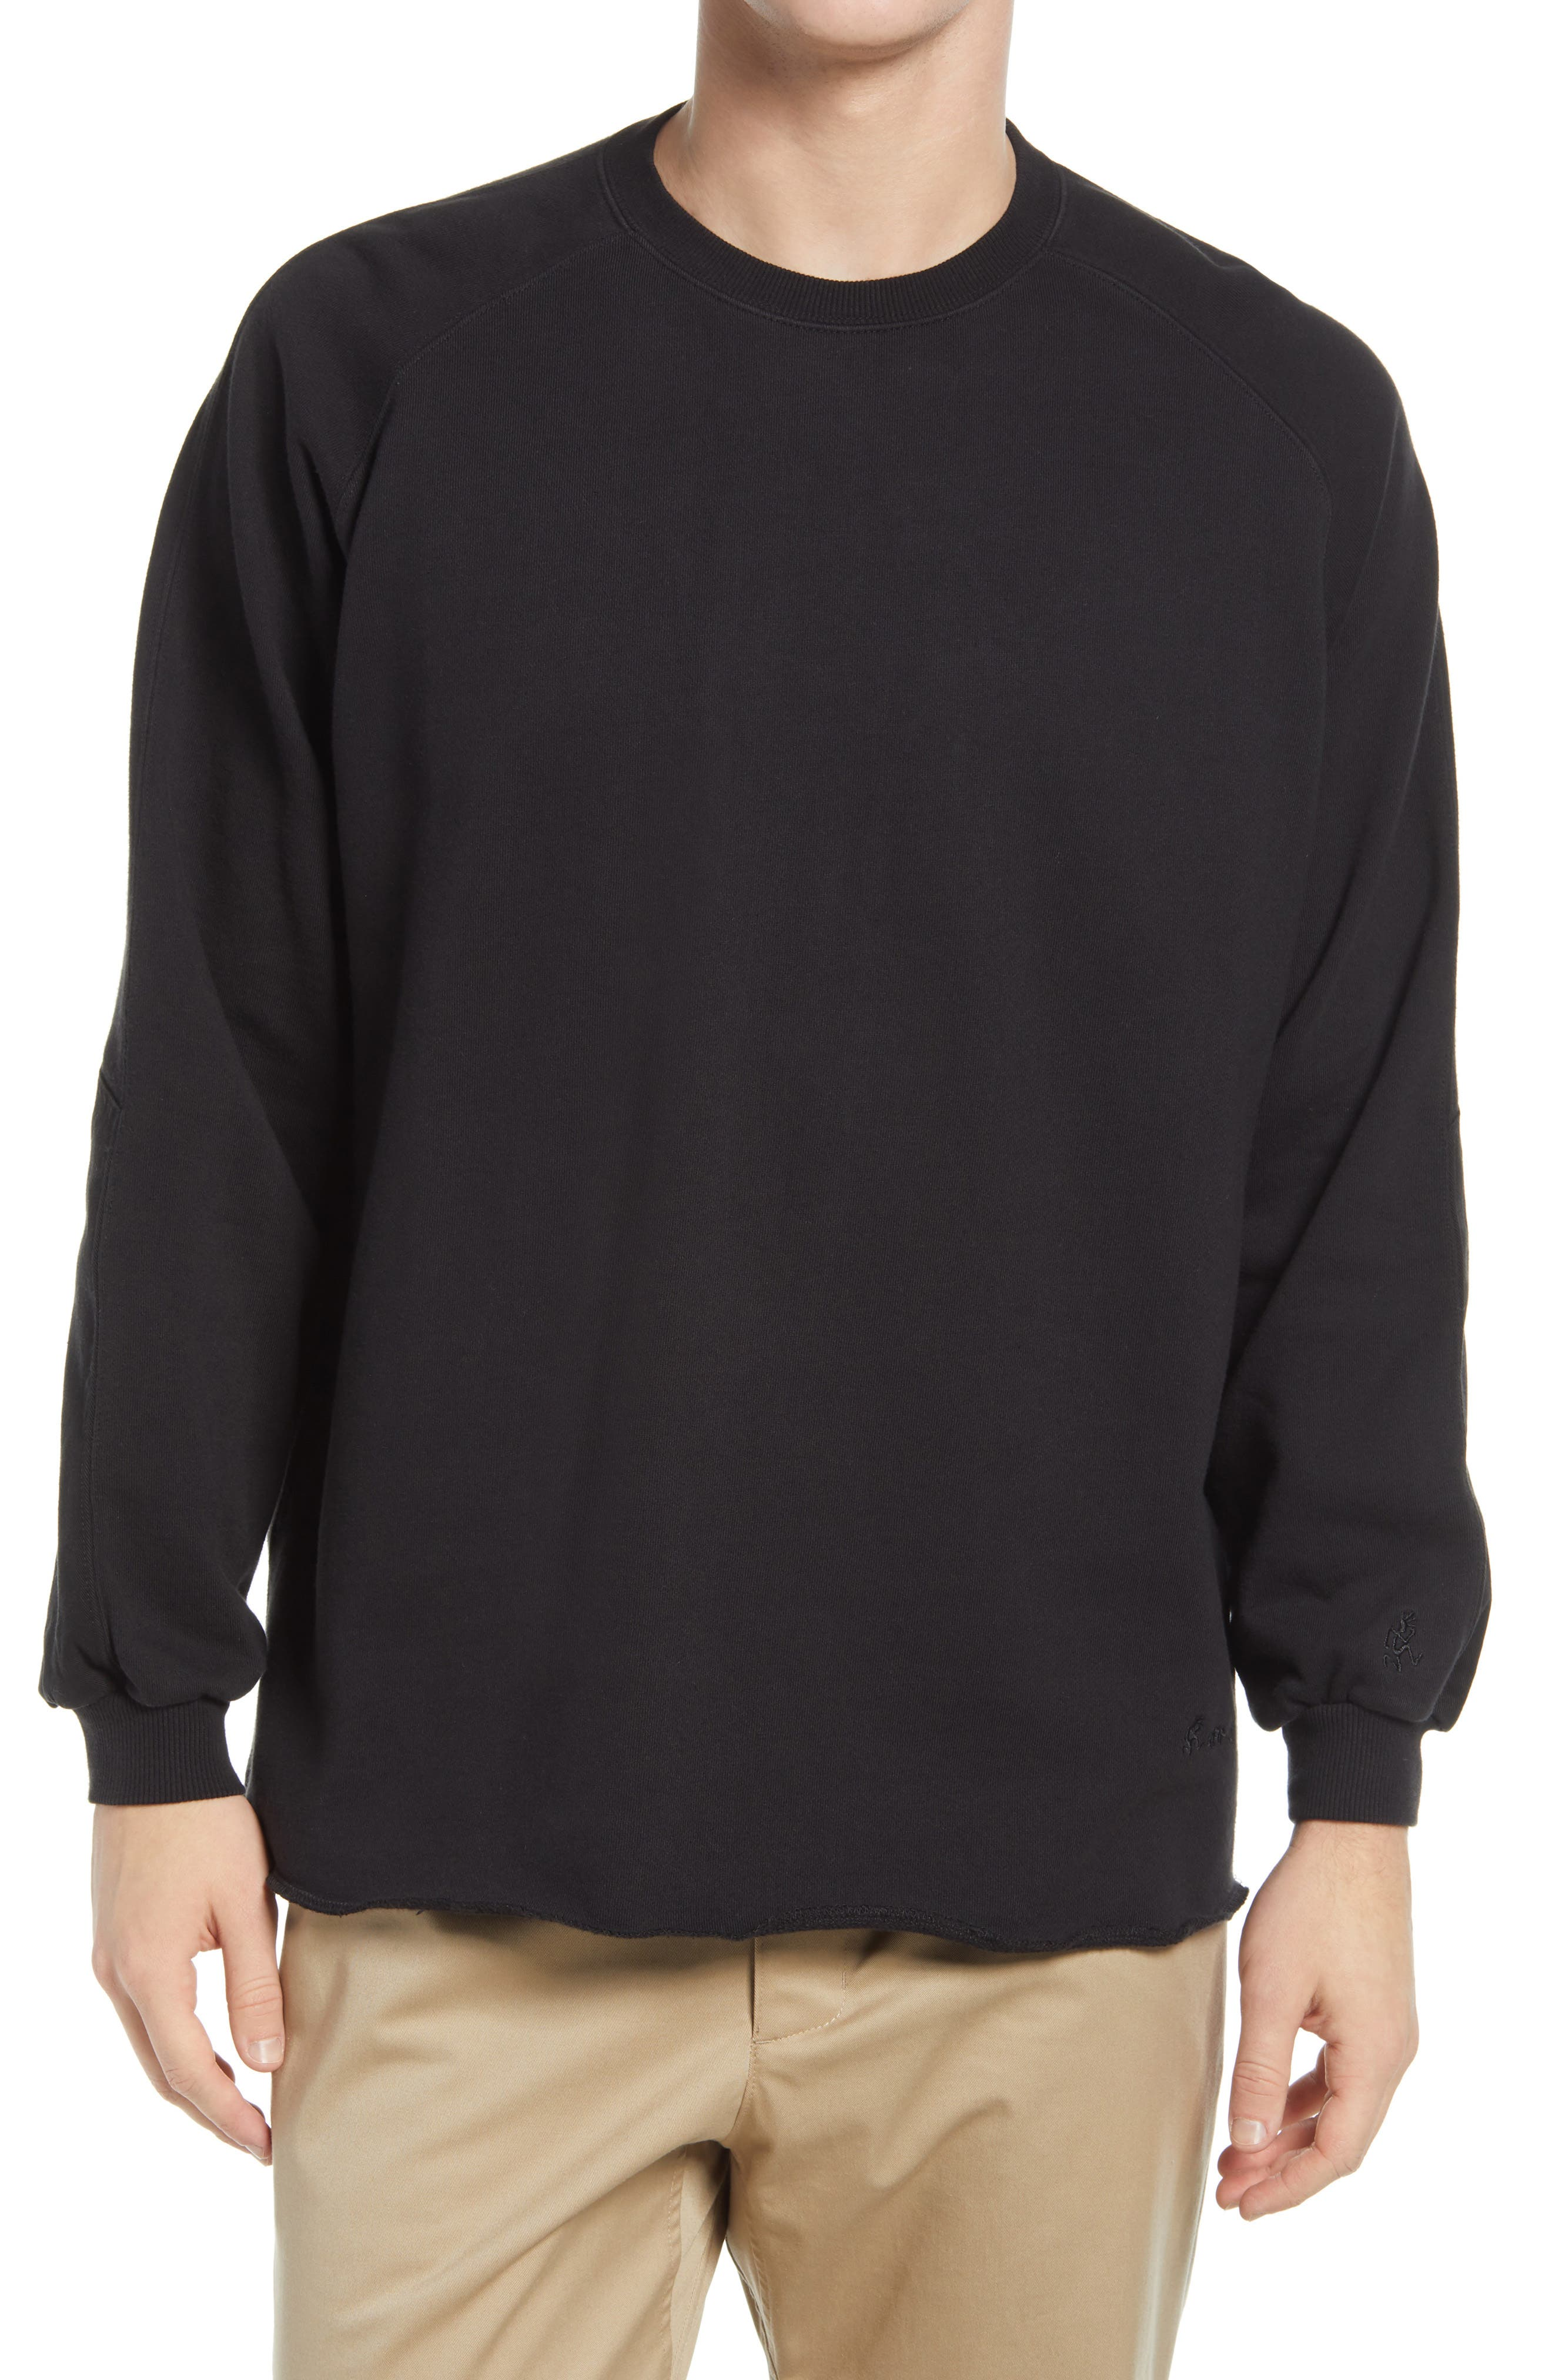 Talecut Crewneck Sweatshirt